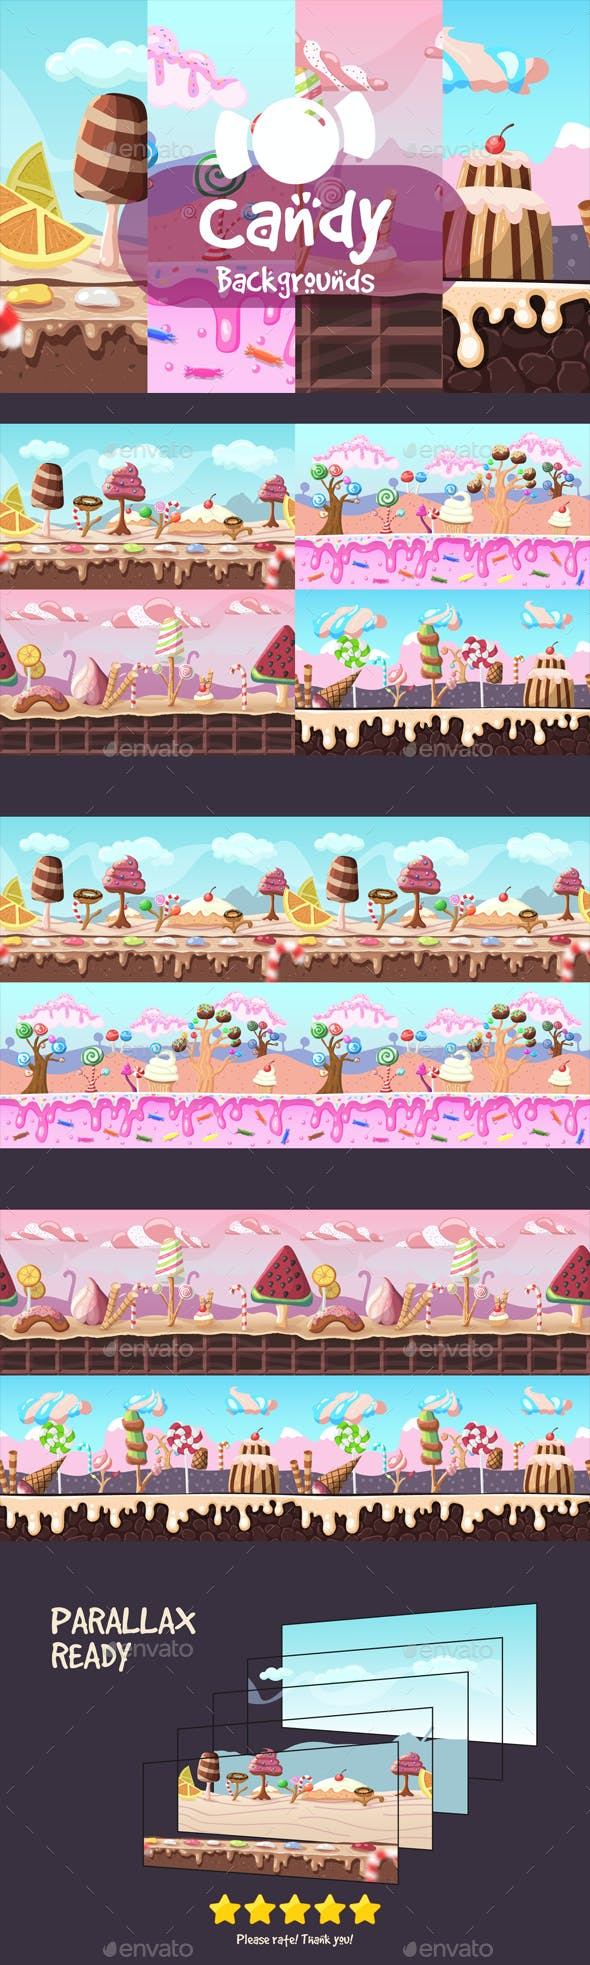 Parallax Candy 2D Backgrounds